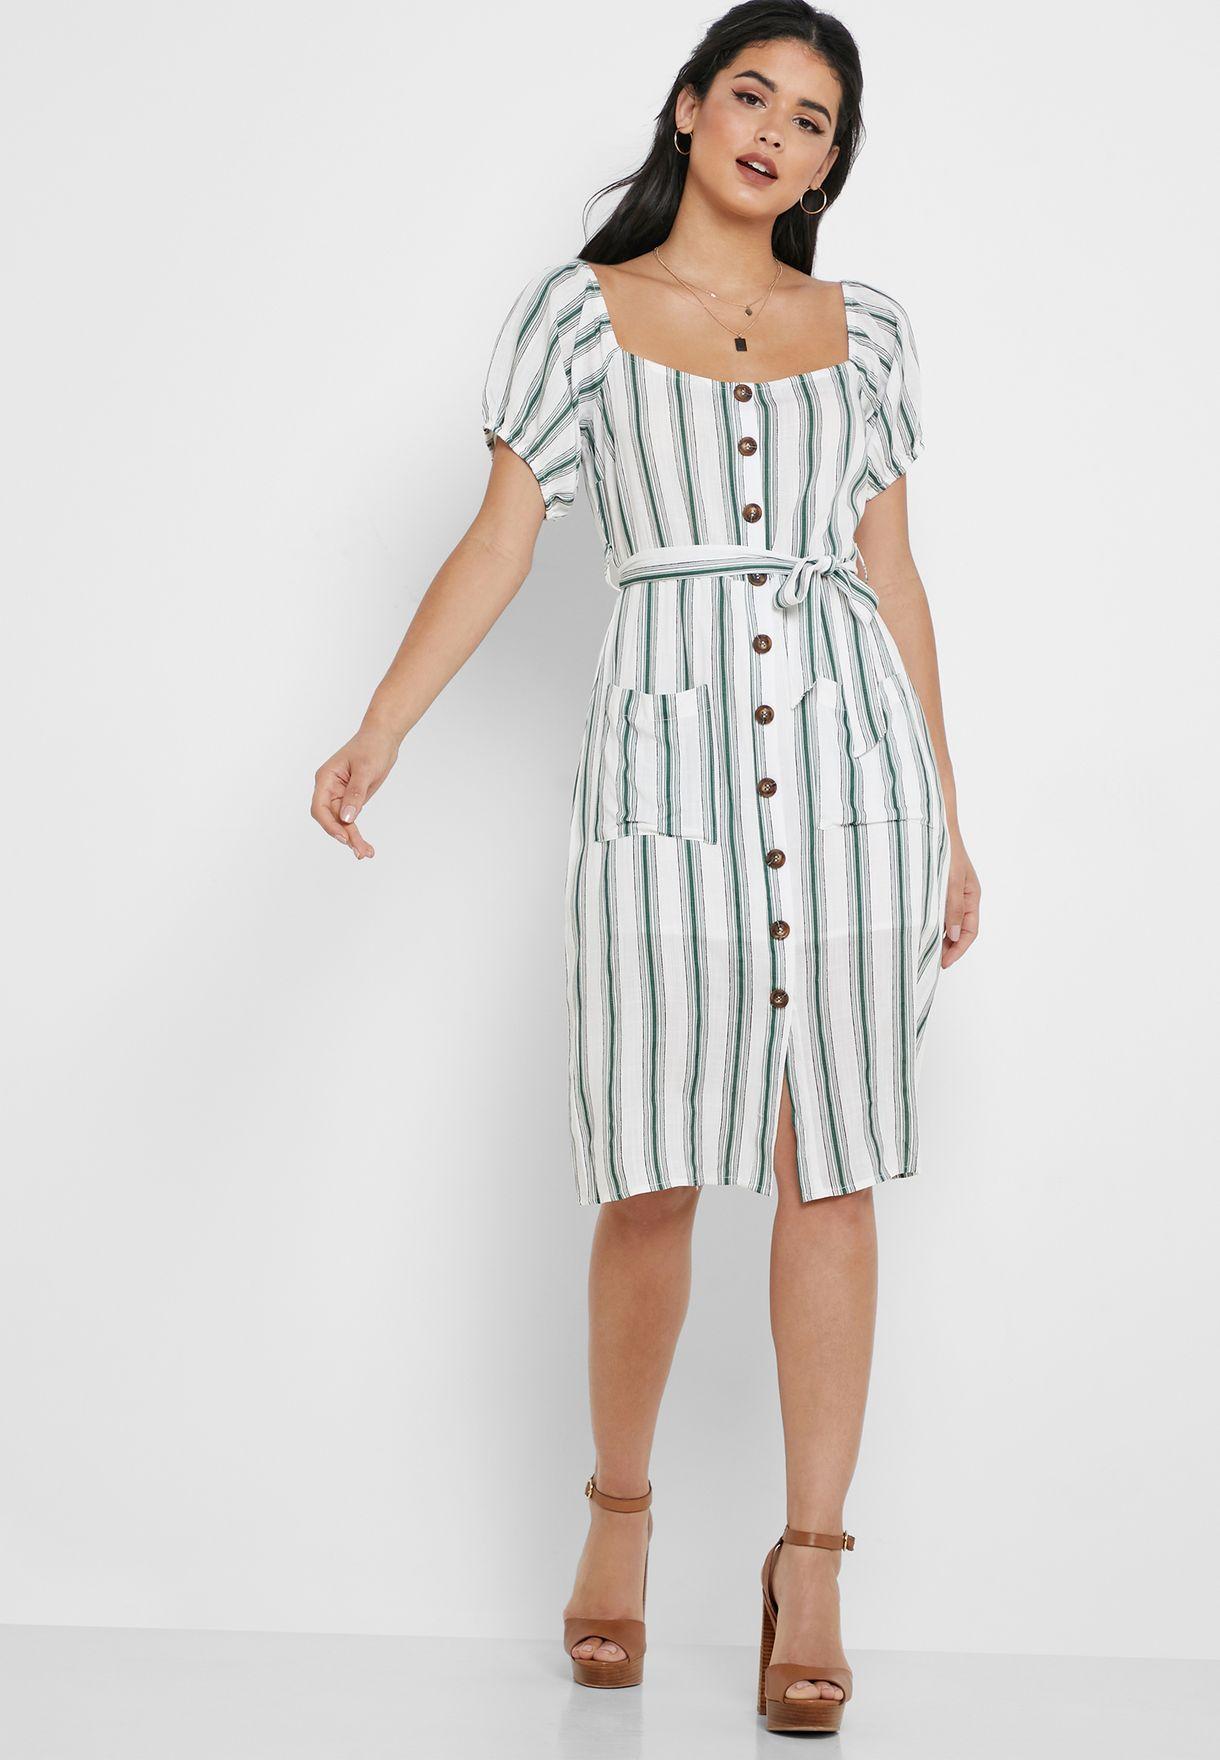 فستان مزين بطبعات